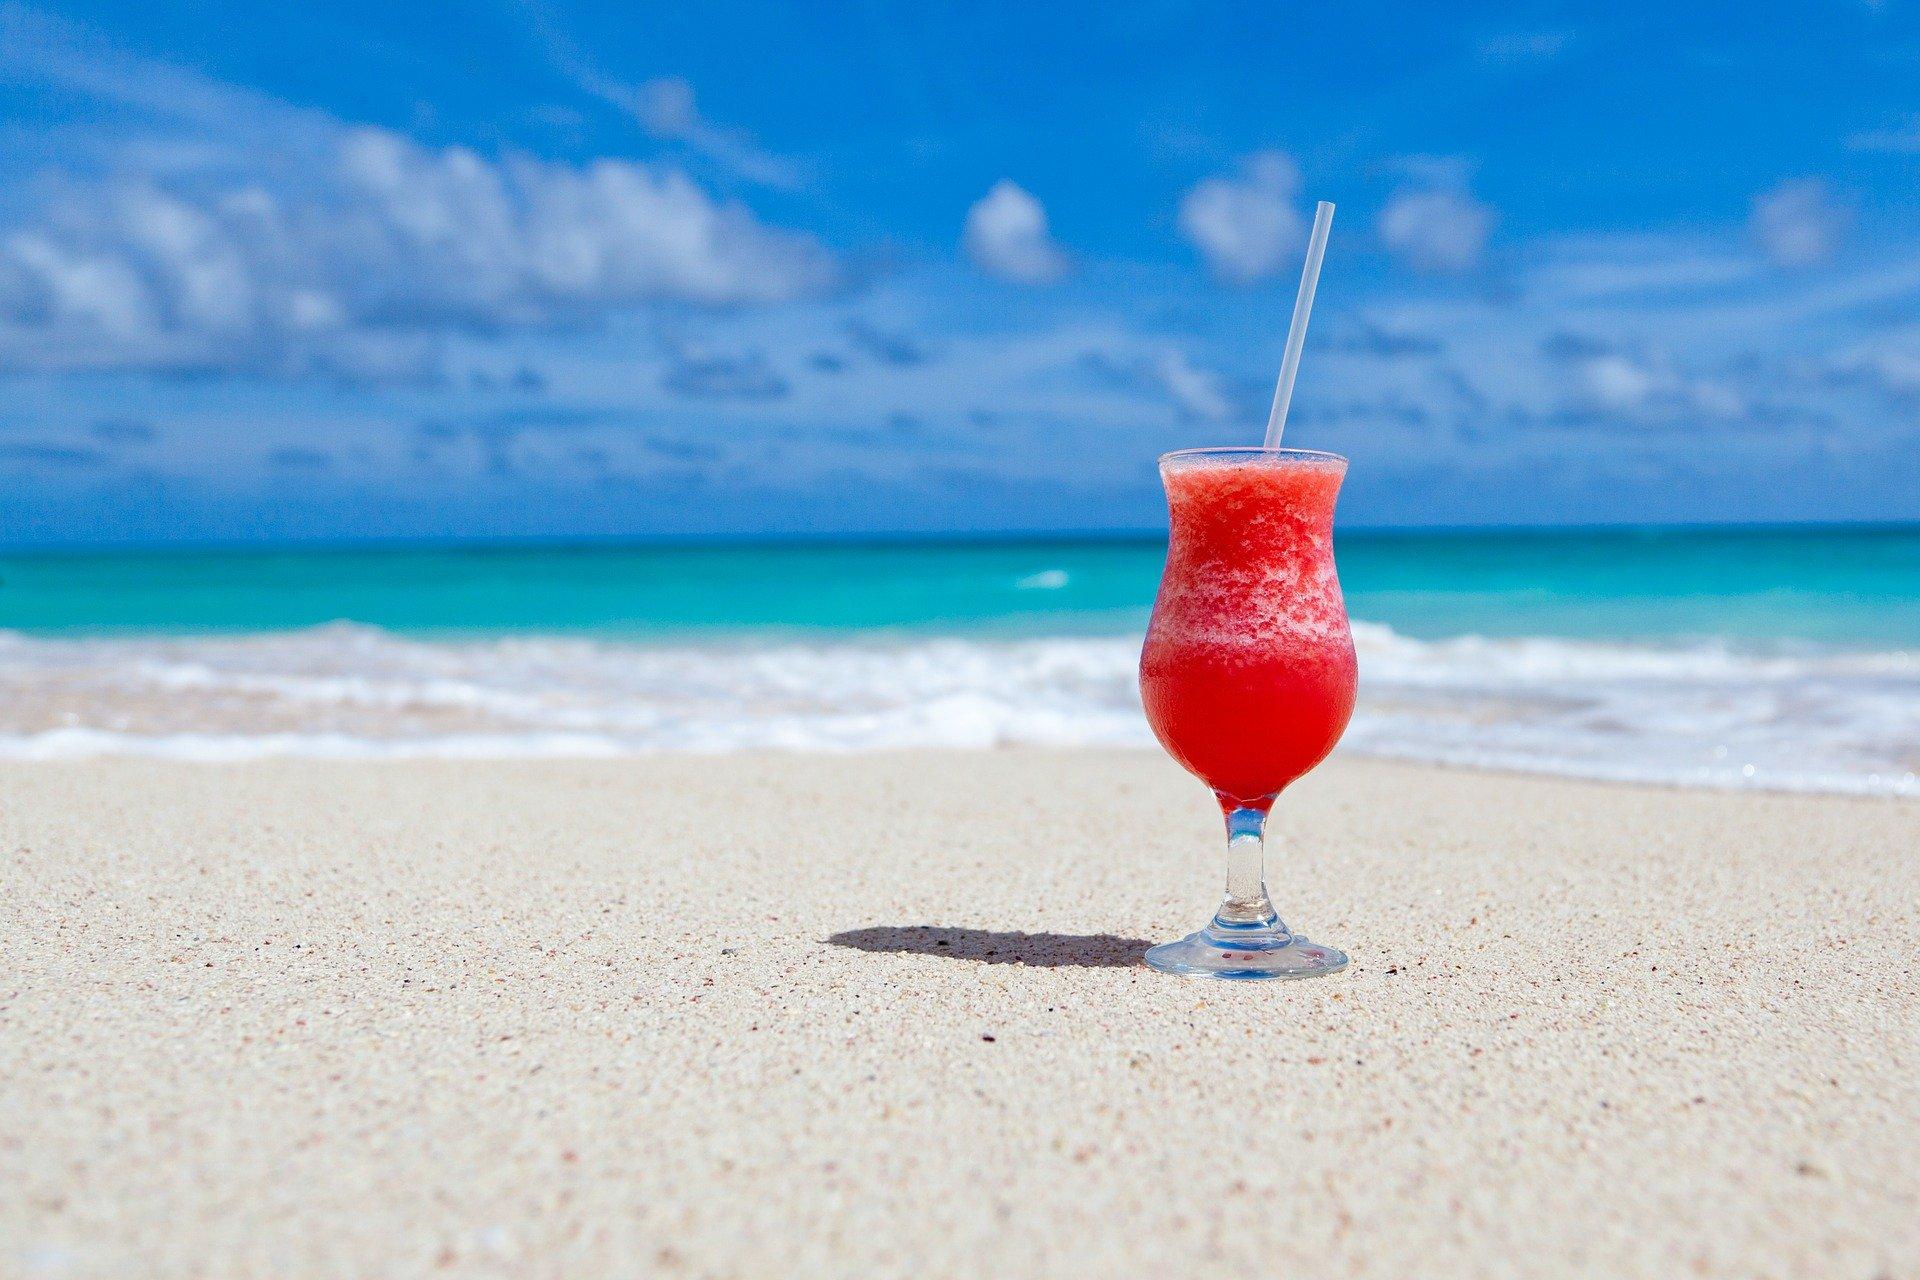 Oferta playa verano 2020